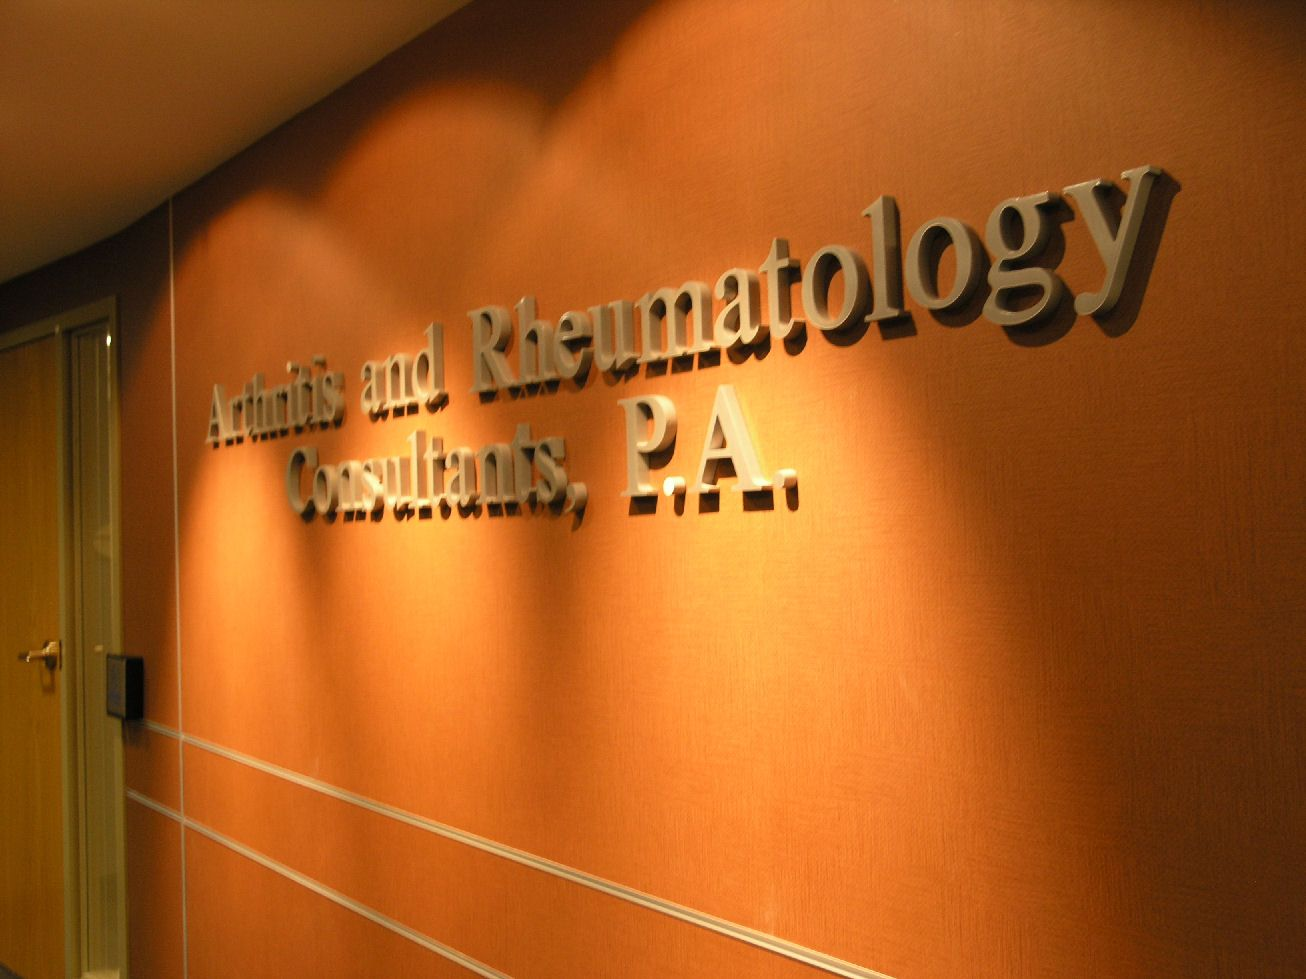 Arthritis rheumatology home page neon signs signs